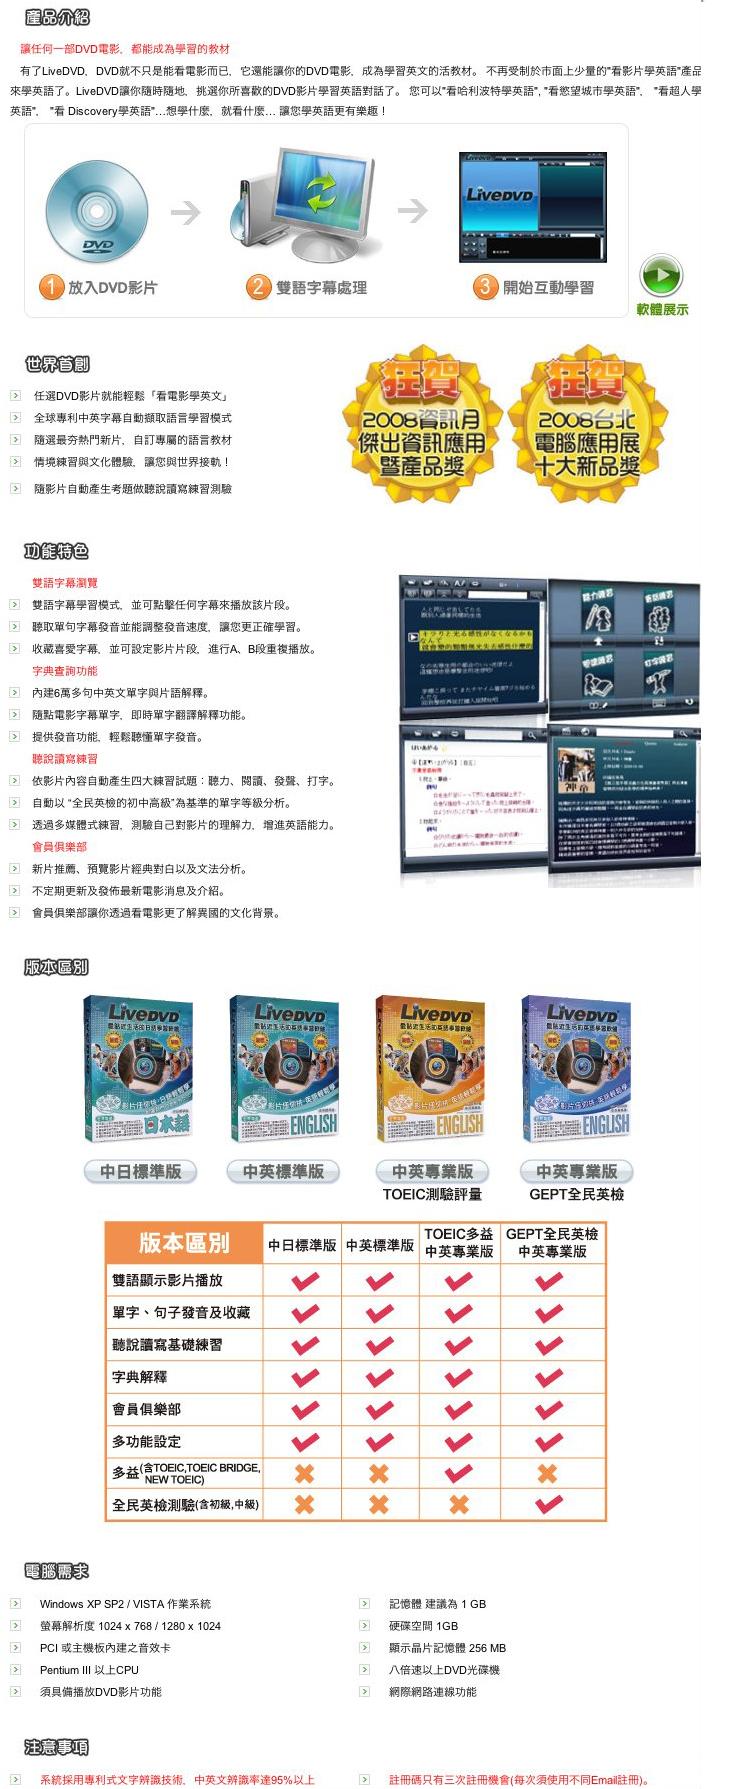 LiveDVD語言學習軟體